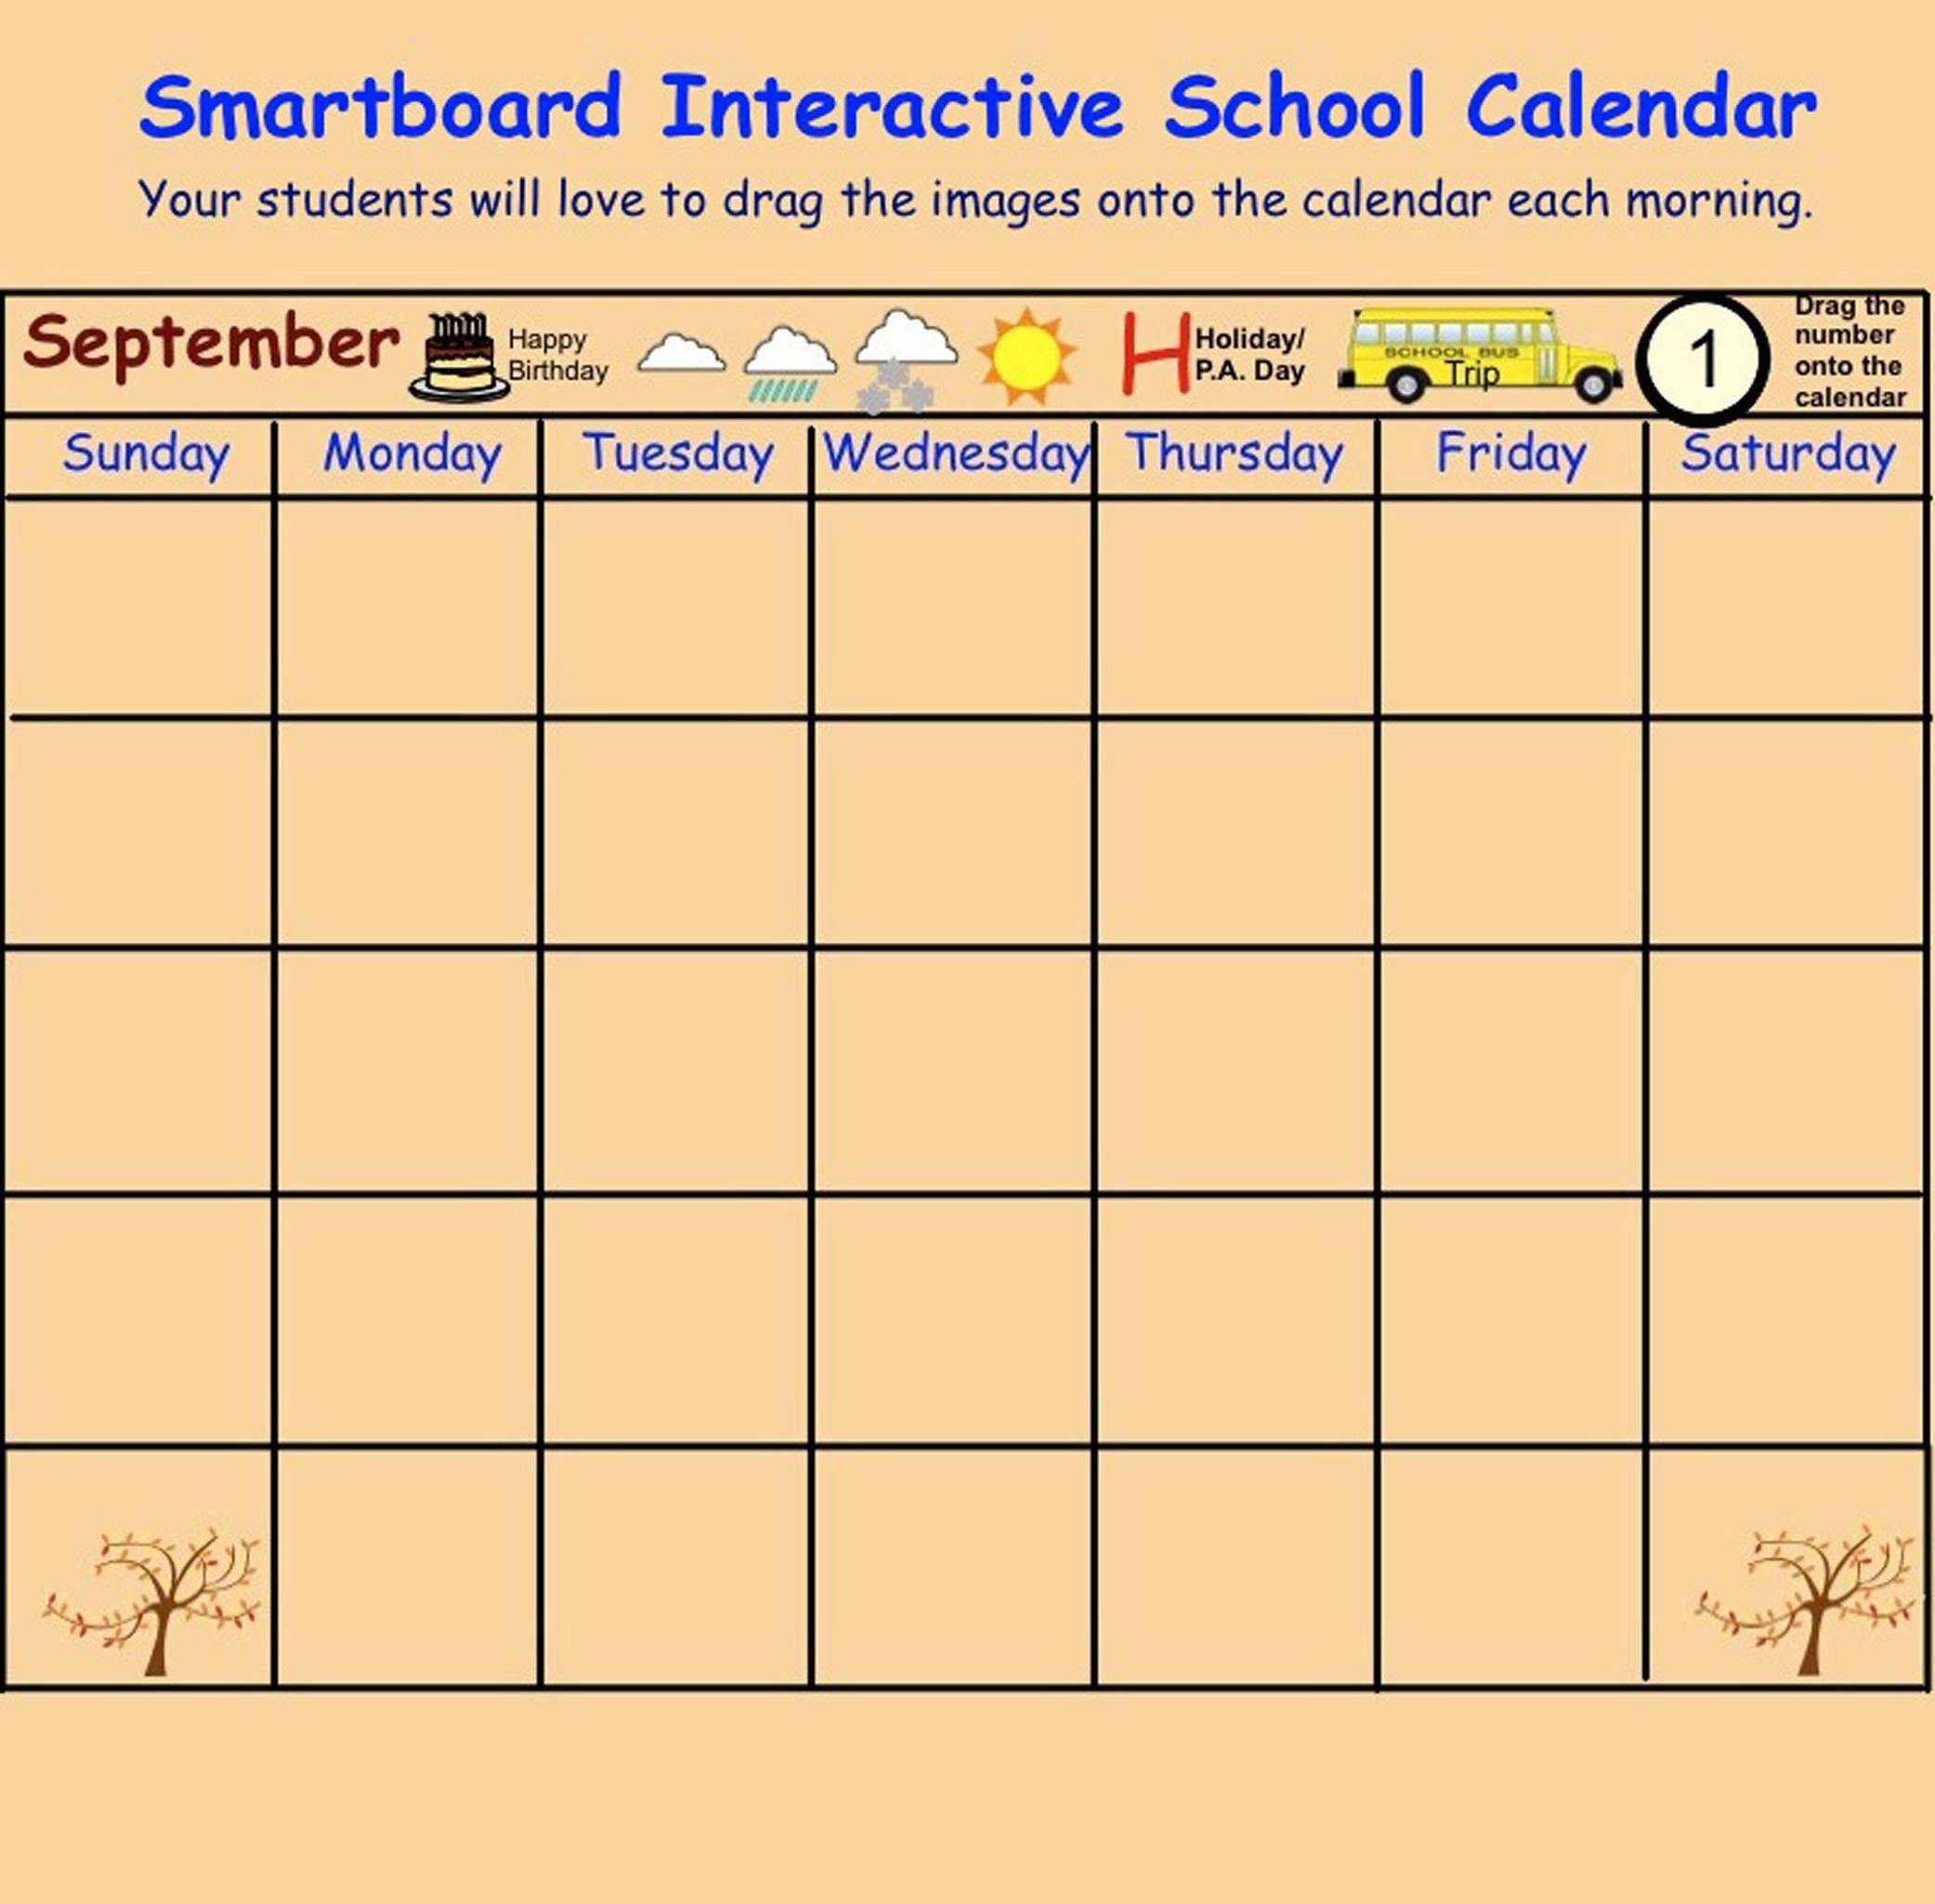 Smartboard Interactive School Calendar Sept June